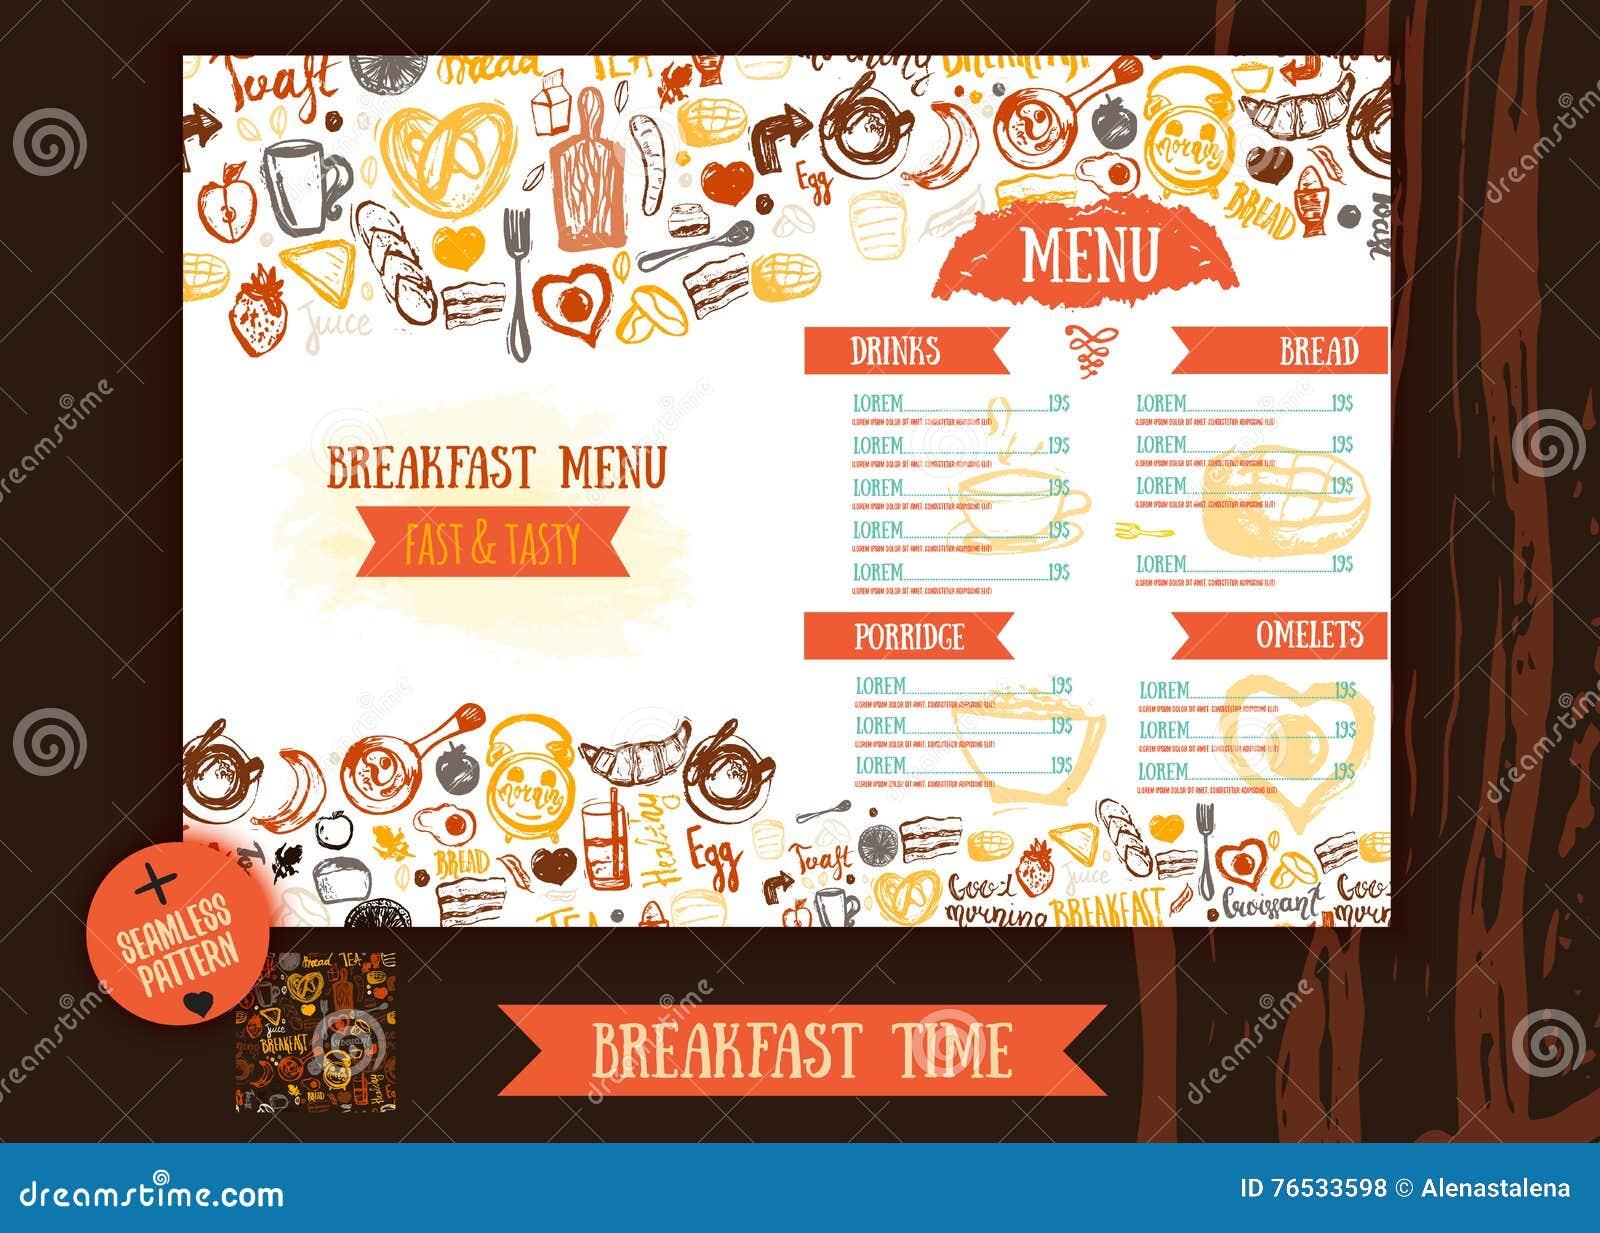 Breakfast Menu Design Template Modern Hand Drawn Sketch With